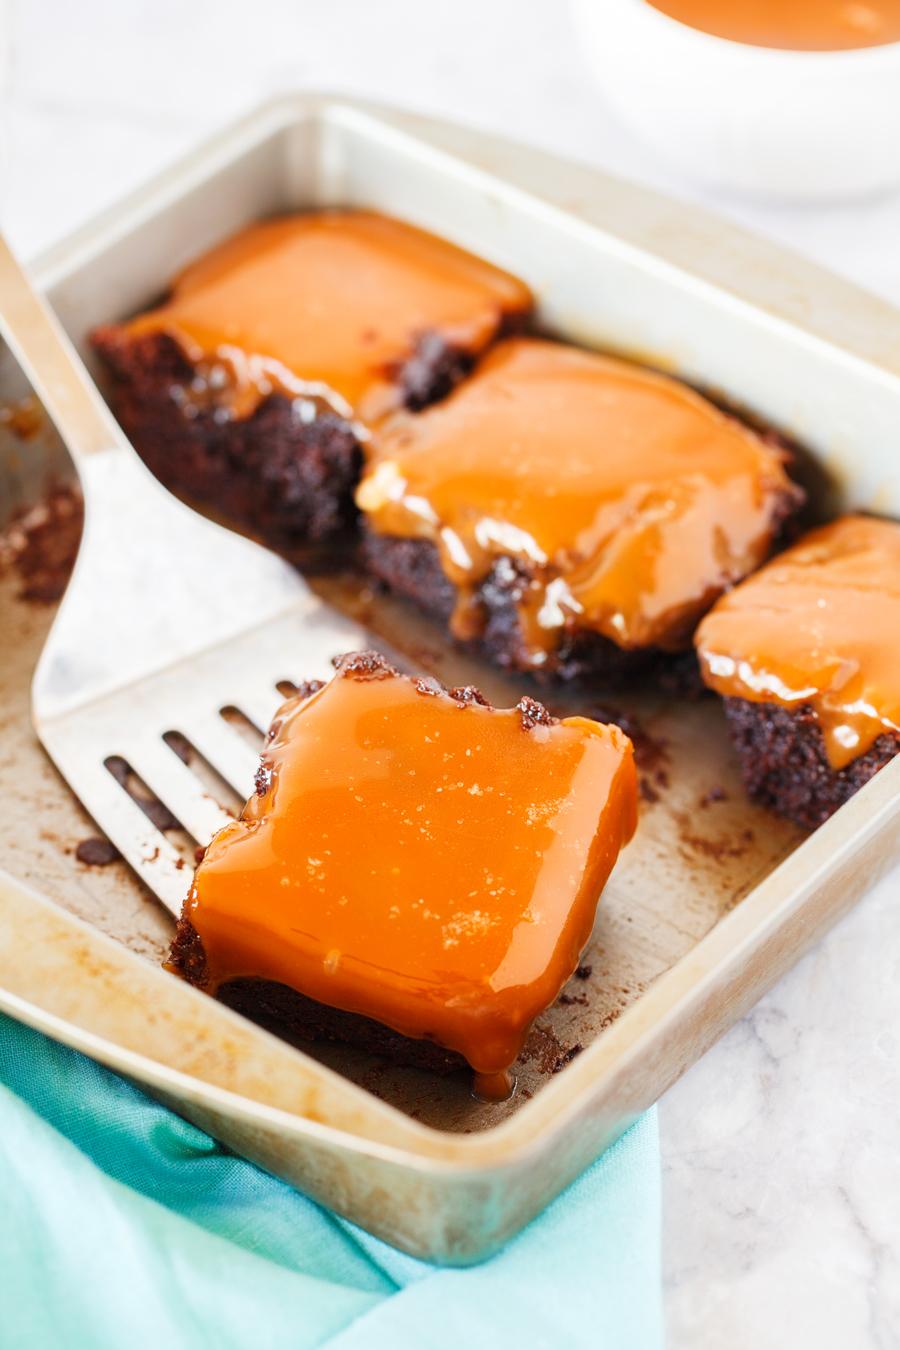 Serving Caramel Brownies